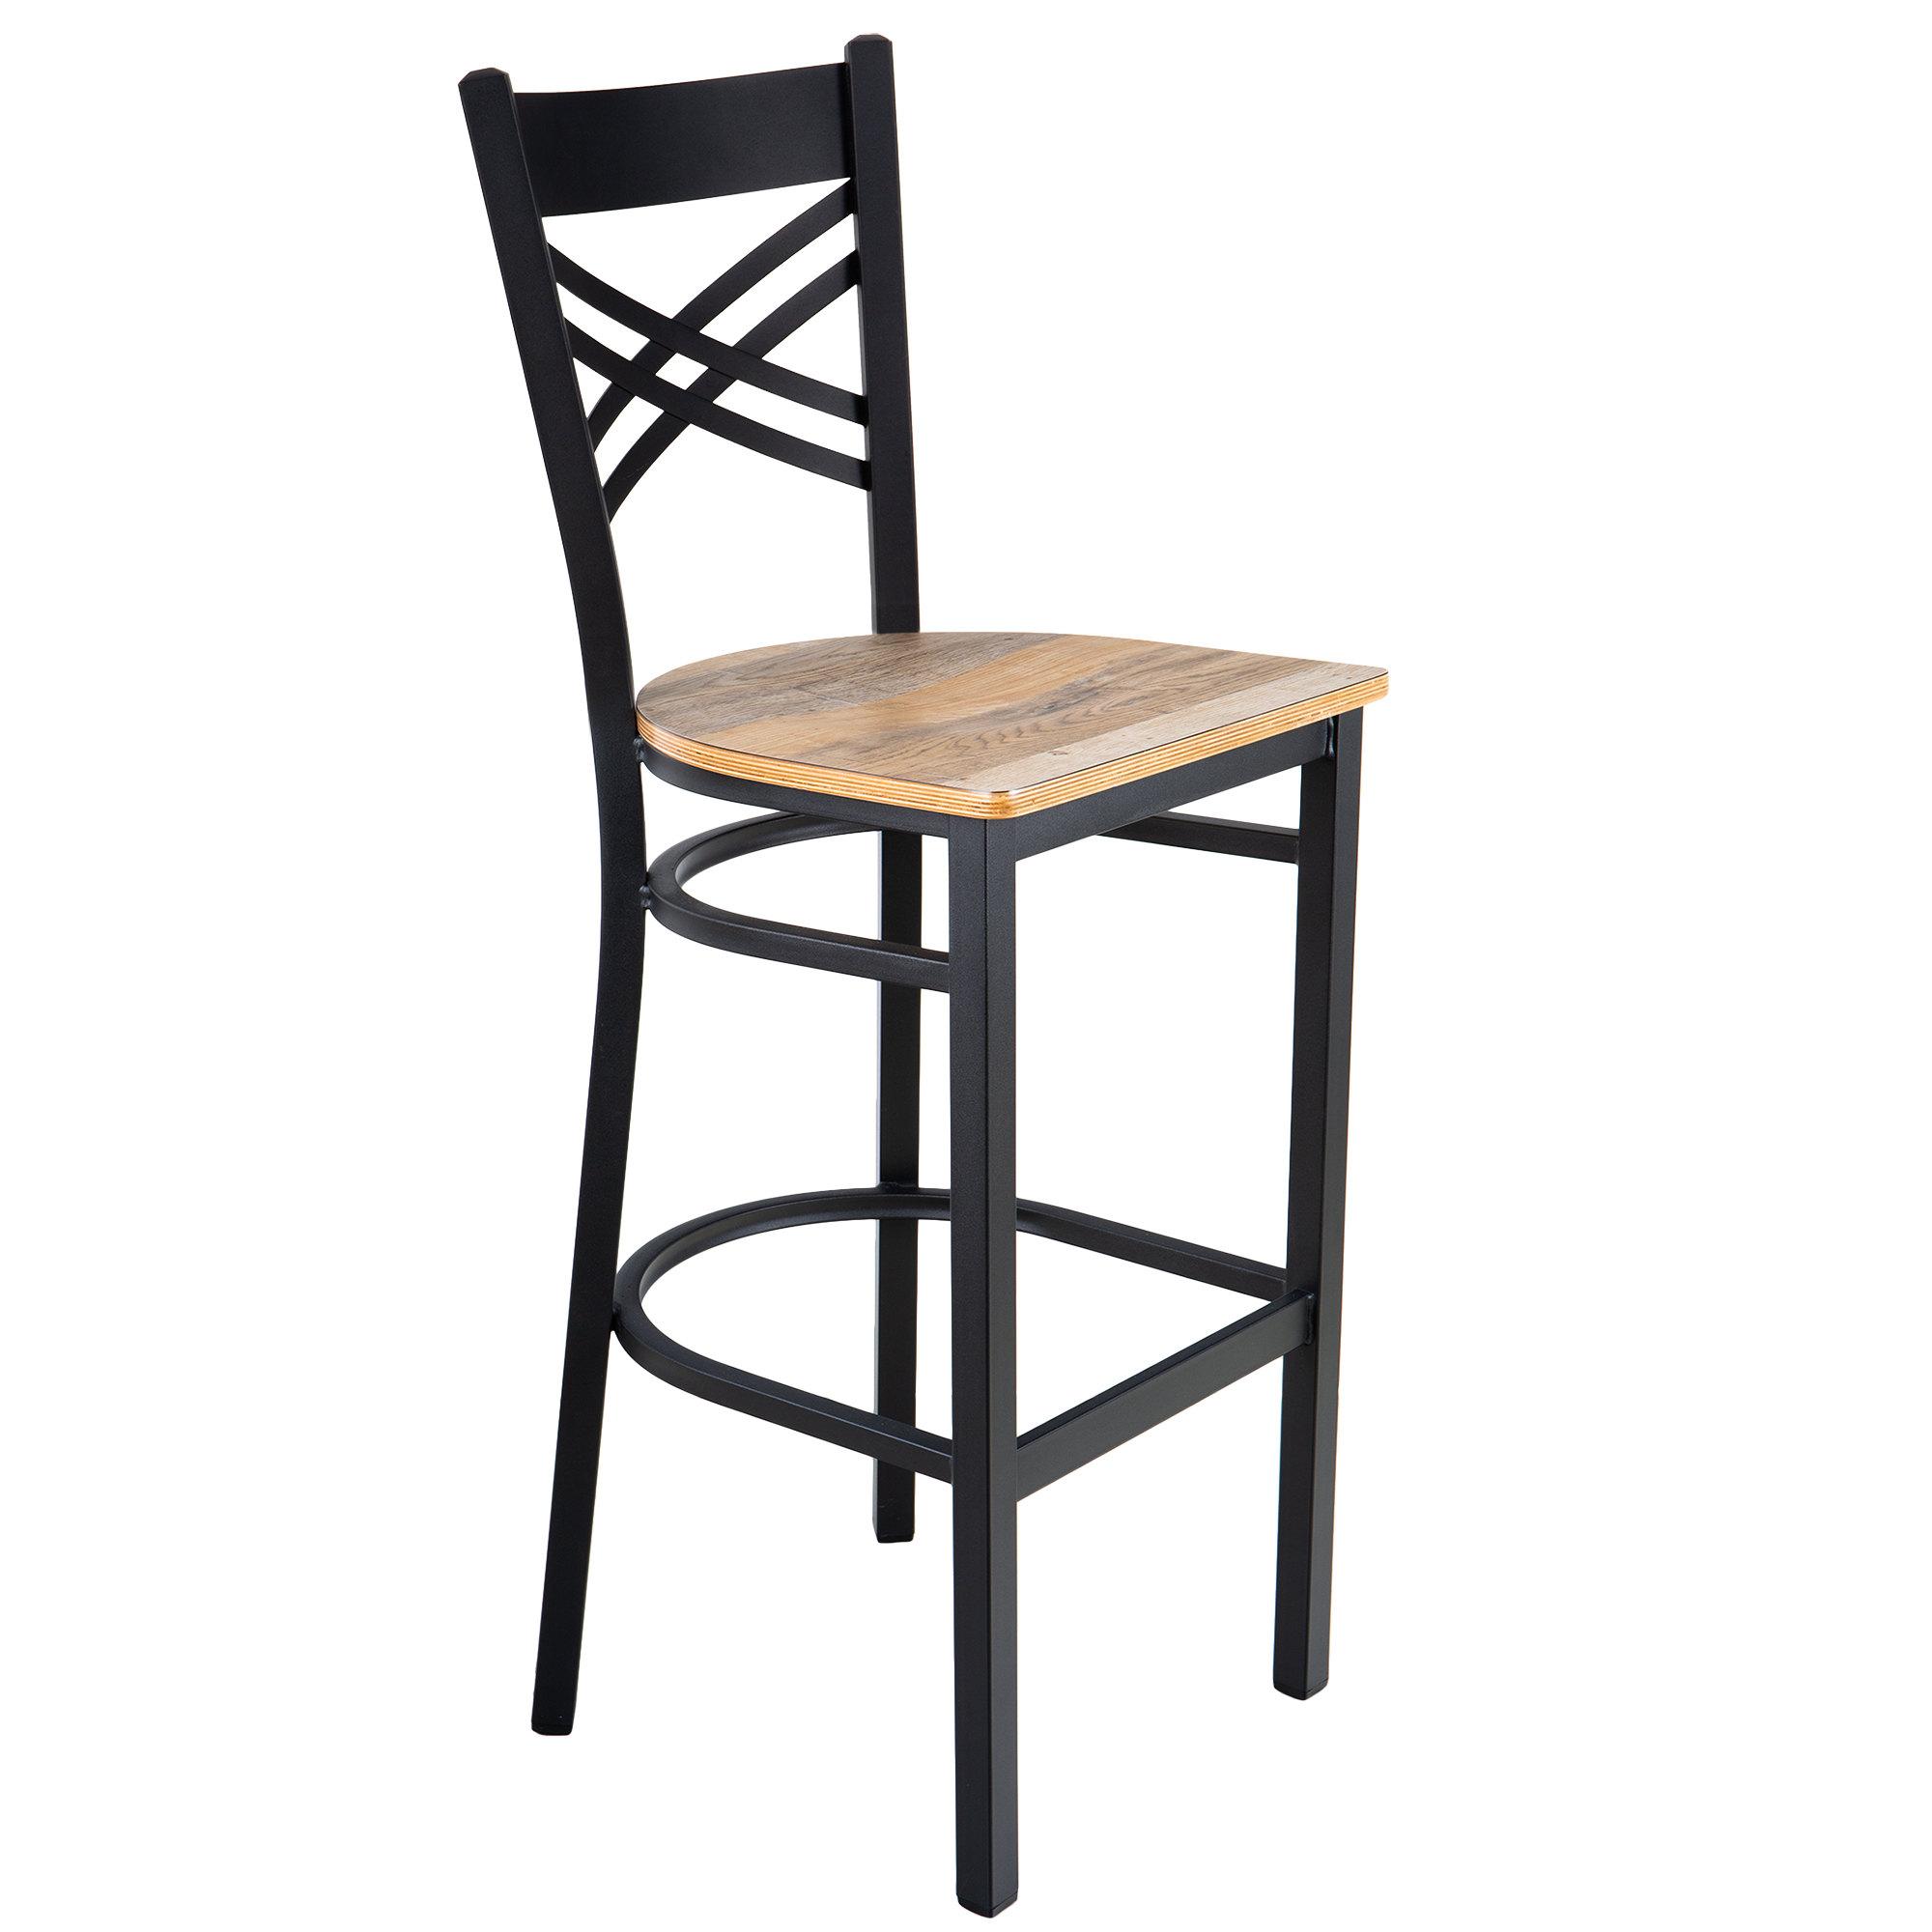 #198 - Black Metal Cross Back Restaurant Barstool with Driftwood Wood Seat